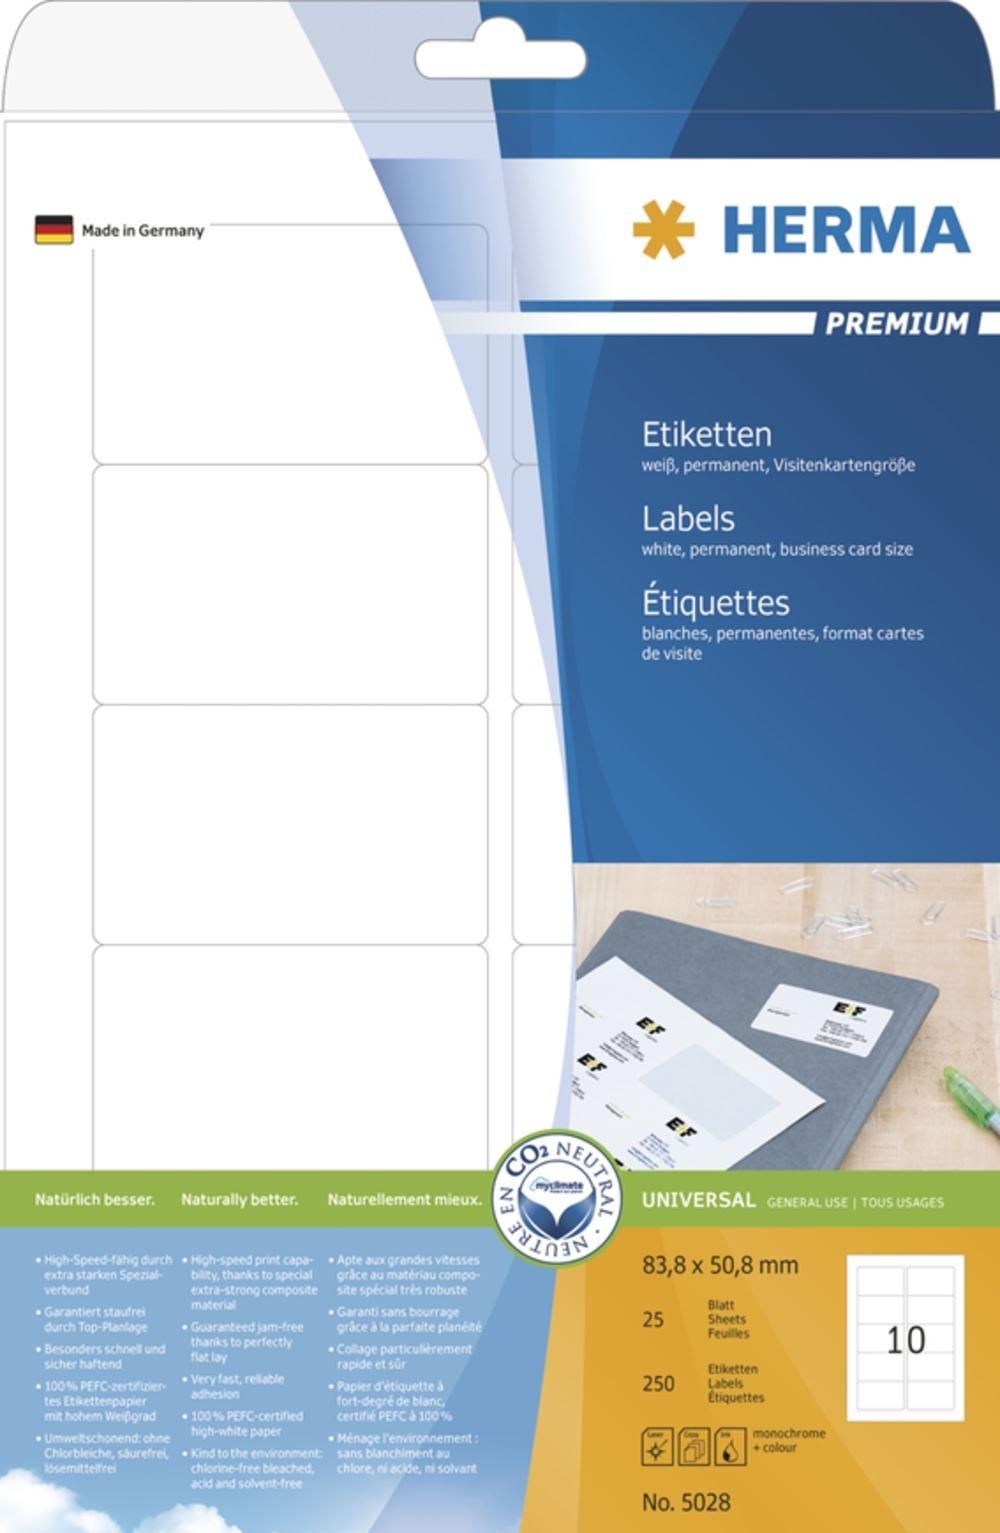 250 Stück weiß Herma 5028 Etiketten Premium A4 Papier matt, 83,8 x 50,8 mm